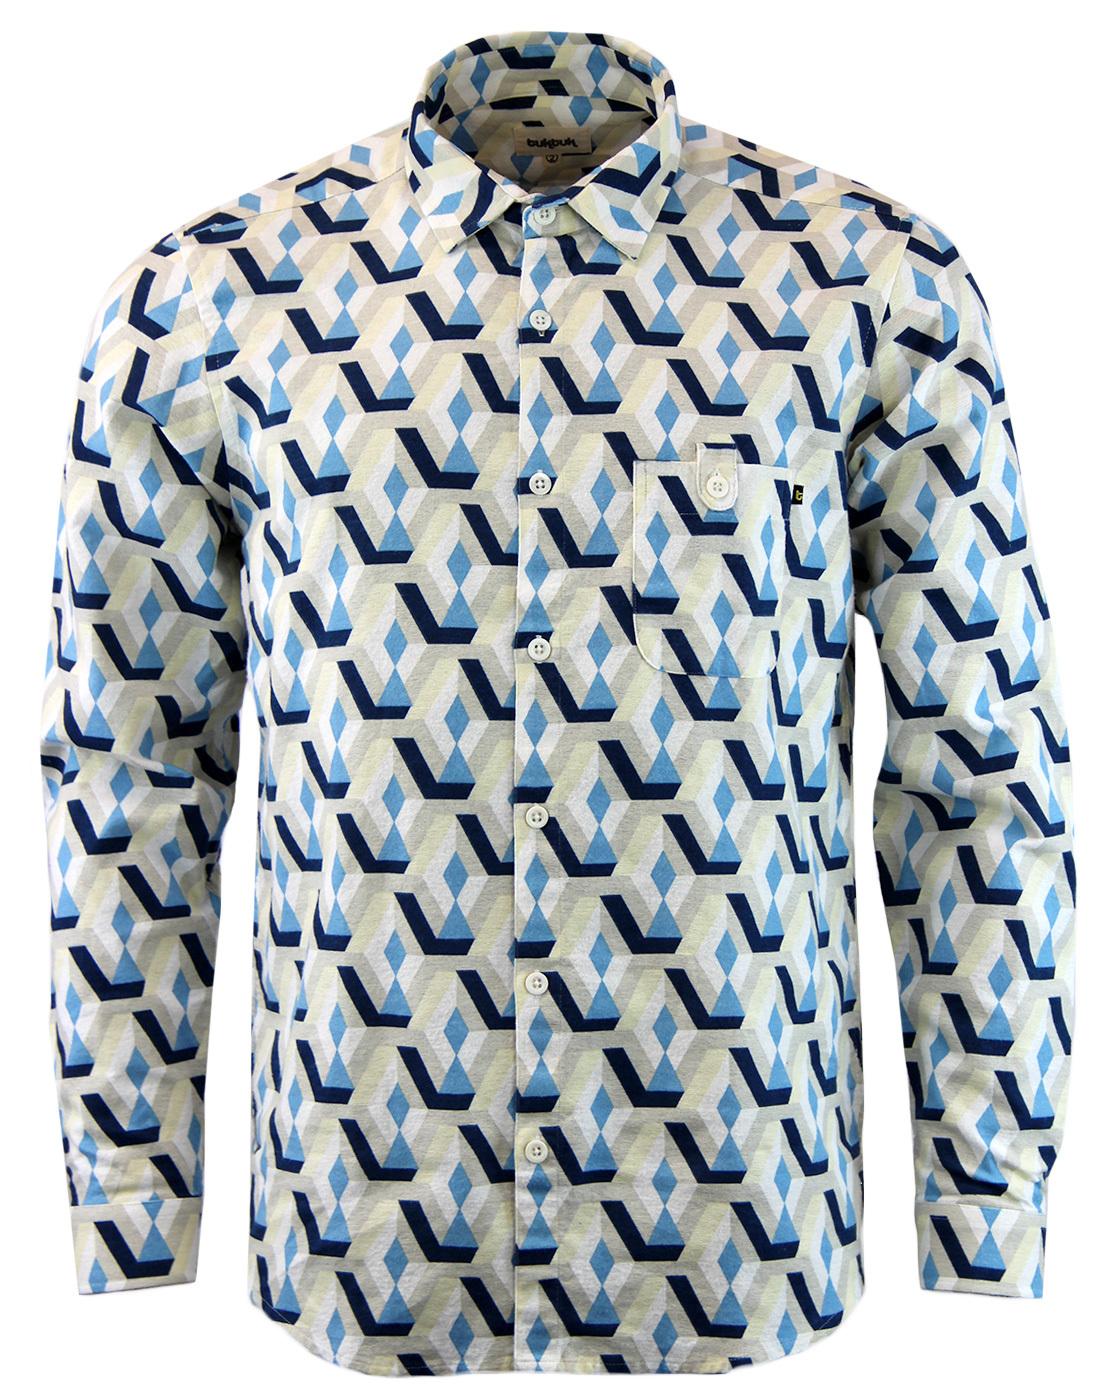 TUKTUK Retro 1970s Vivid Psychedelic Op Art Shirt